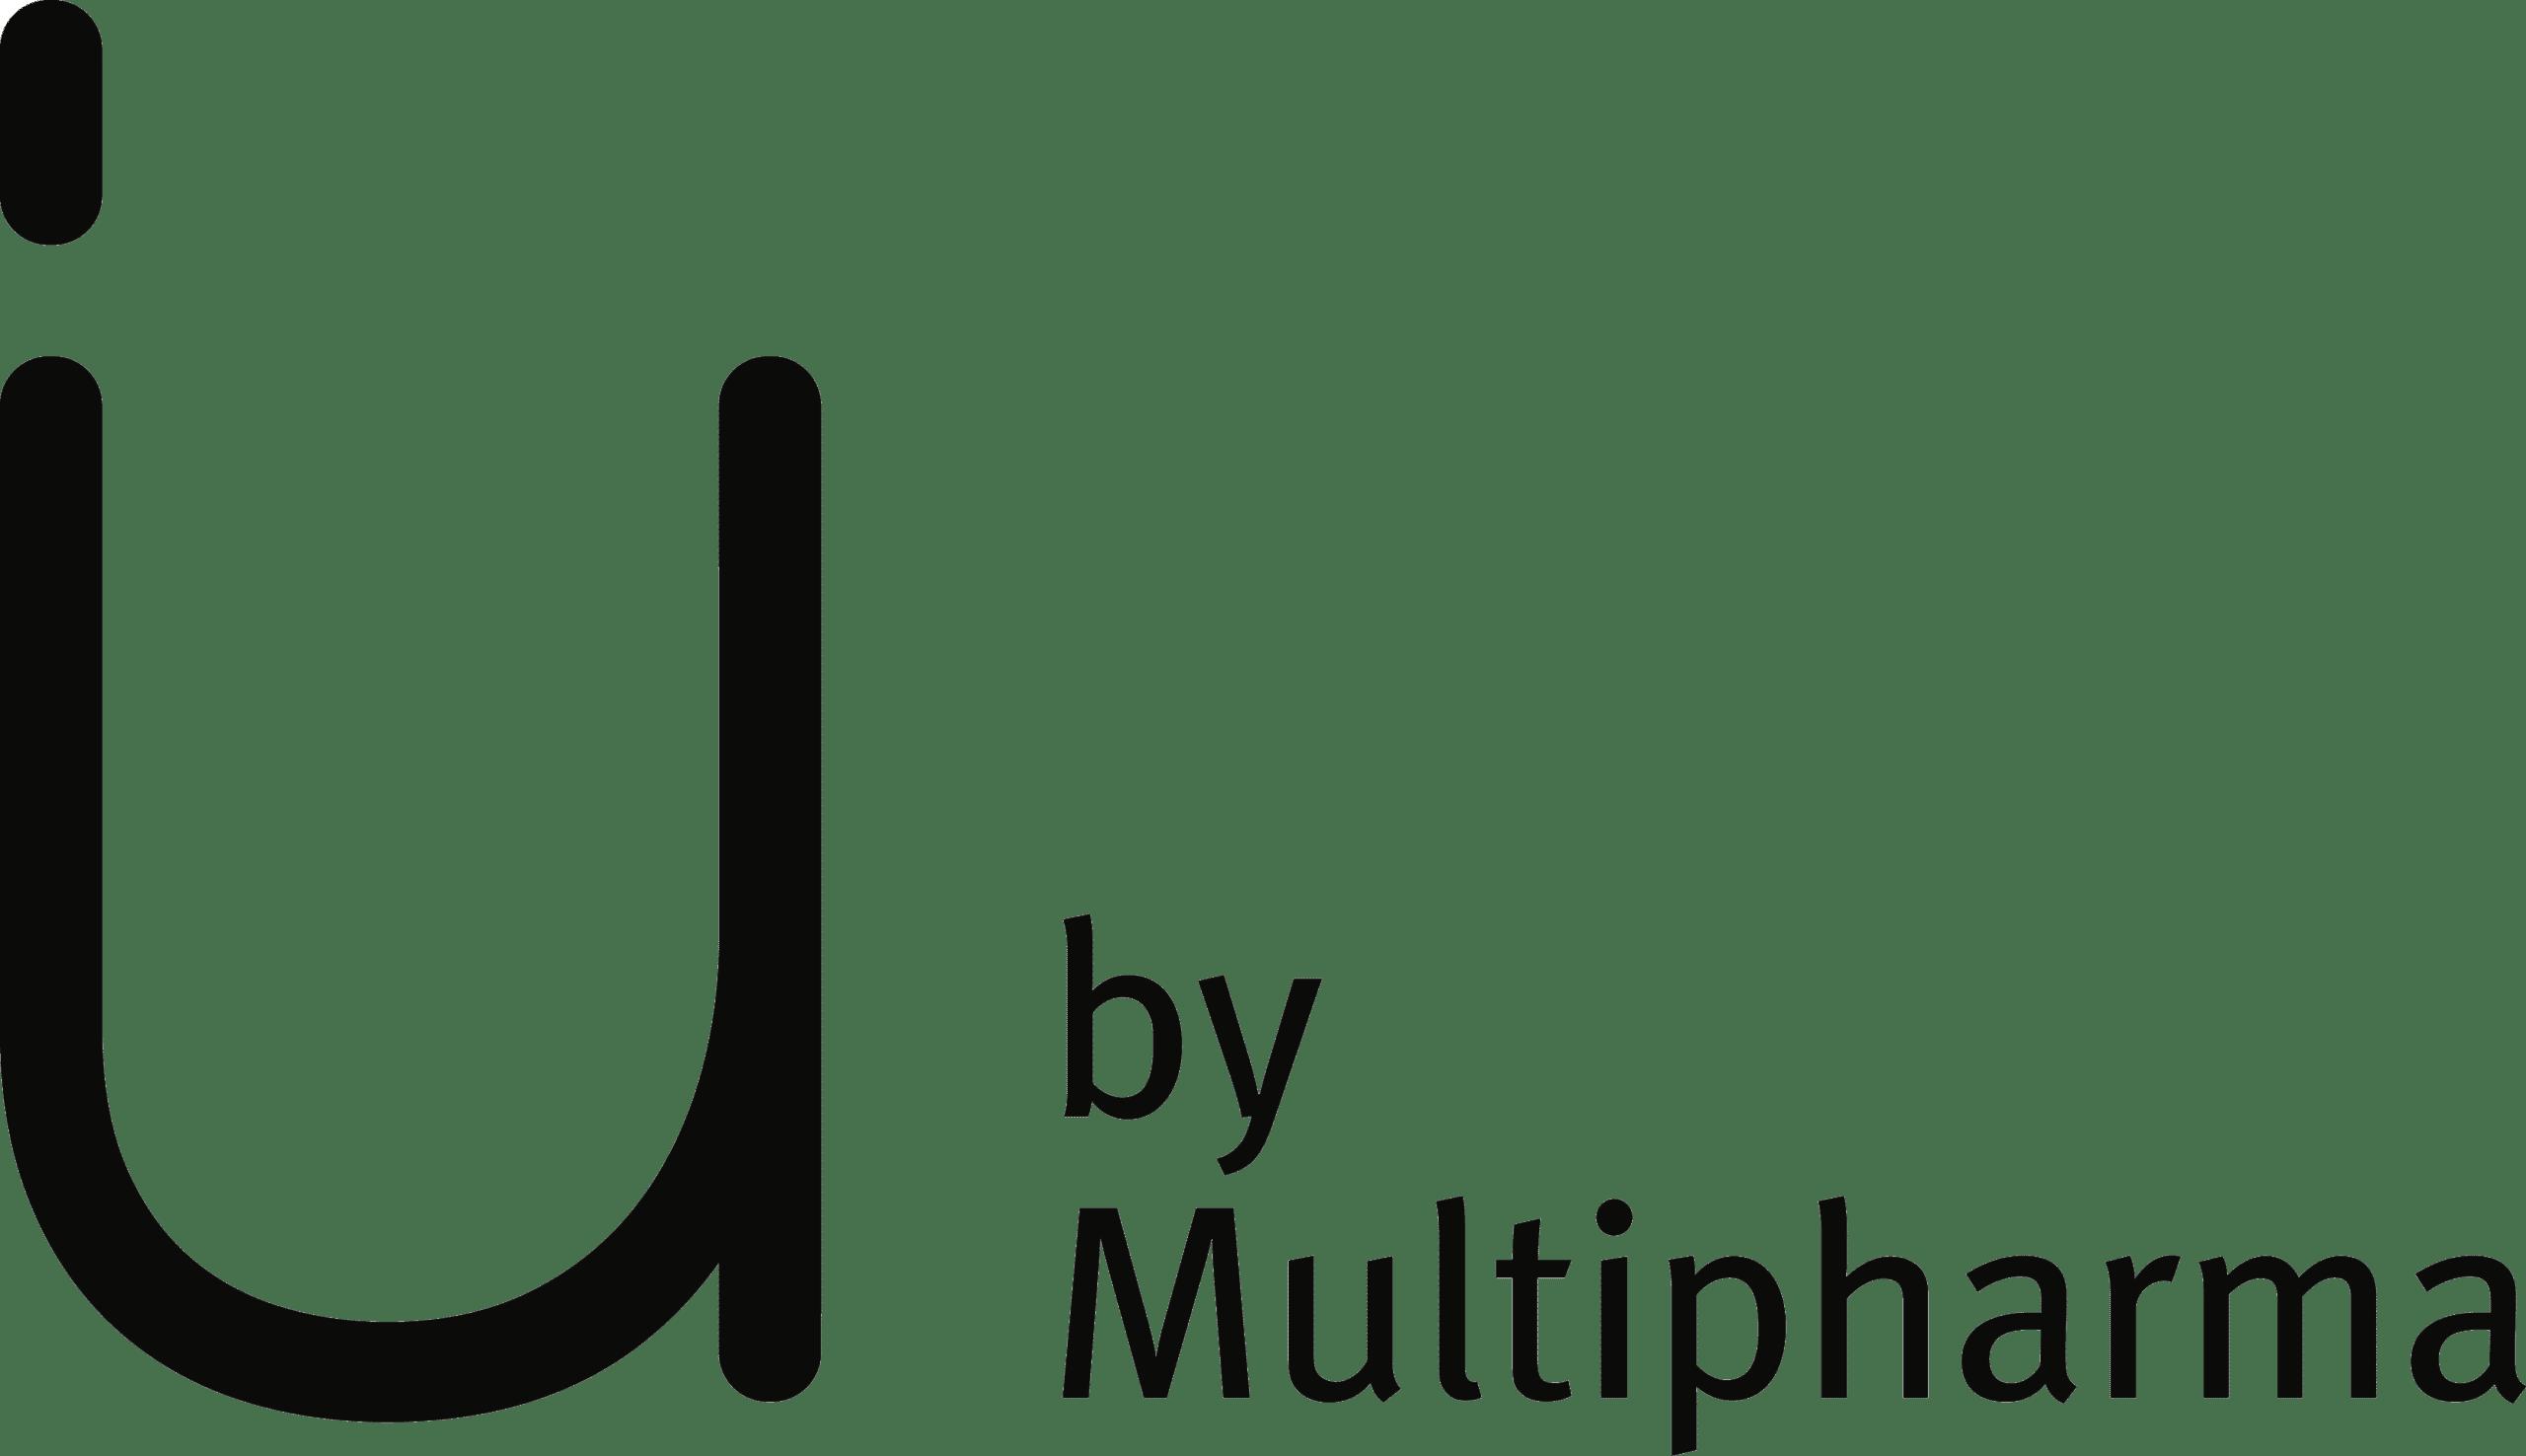 iU by Multipharma at Docks Bruxsel